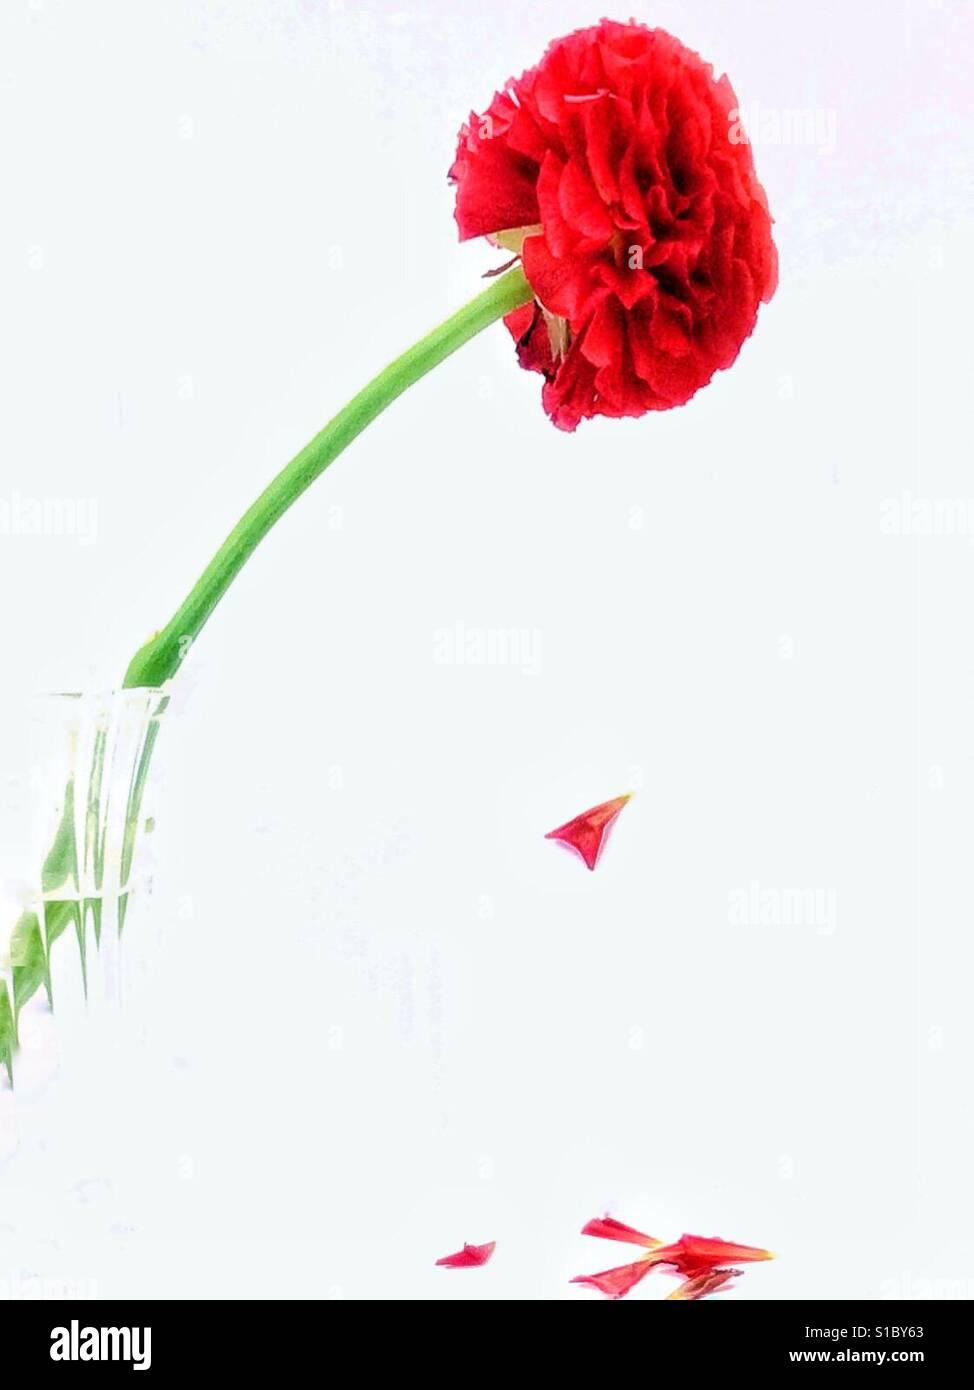 Cut flower, falling petals - Stock Image